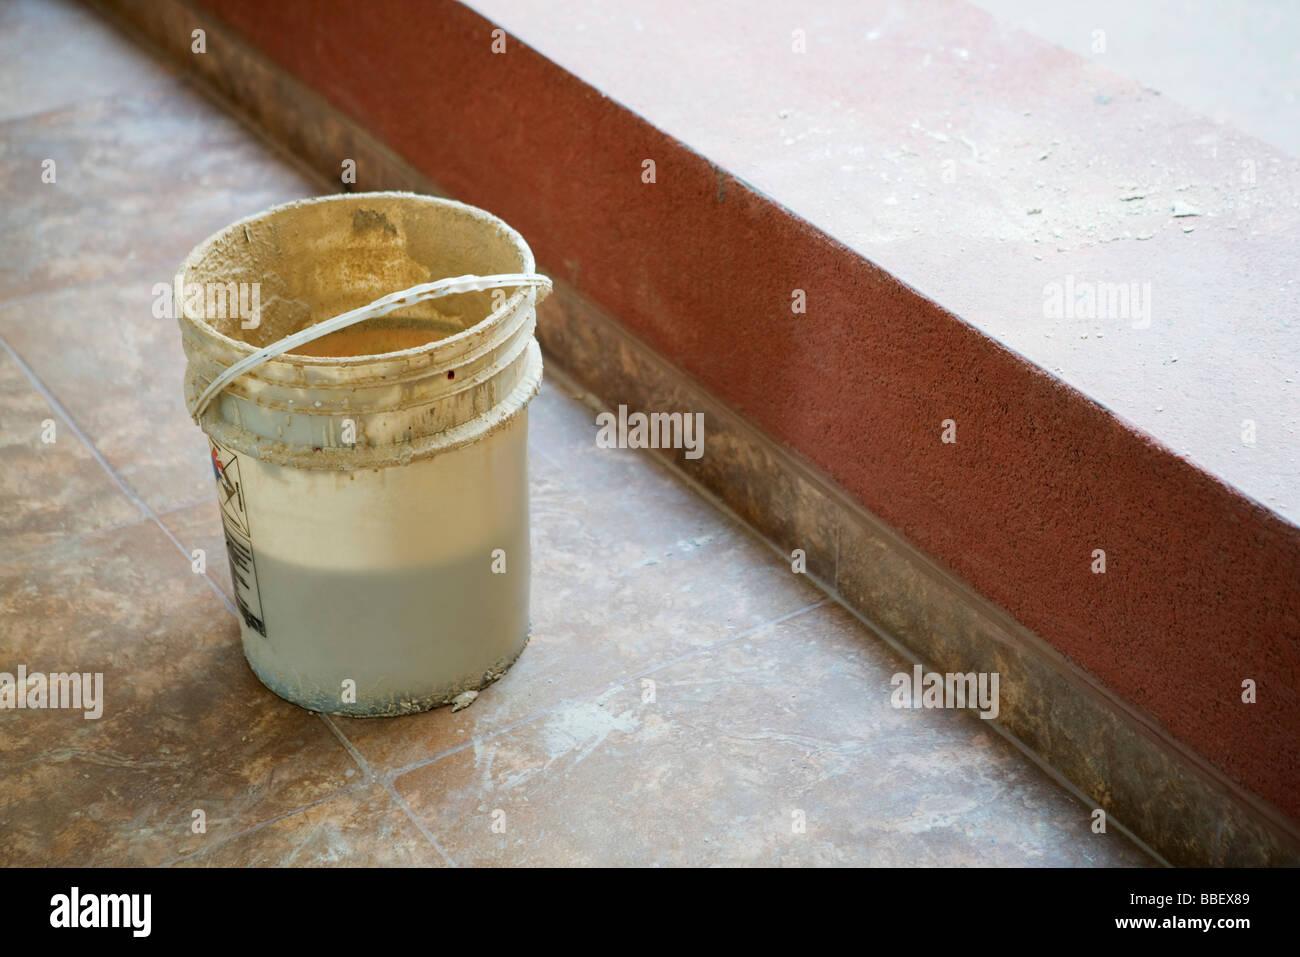 Bucket set on tiled floor near ledge - Stock Image